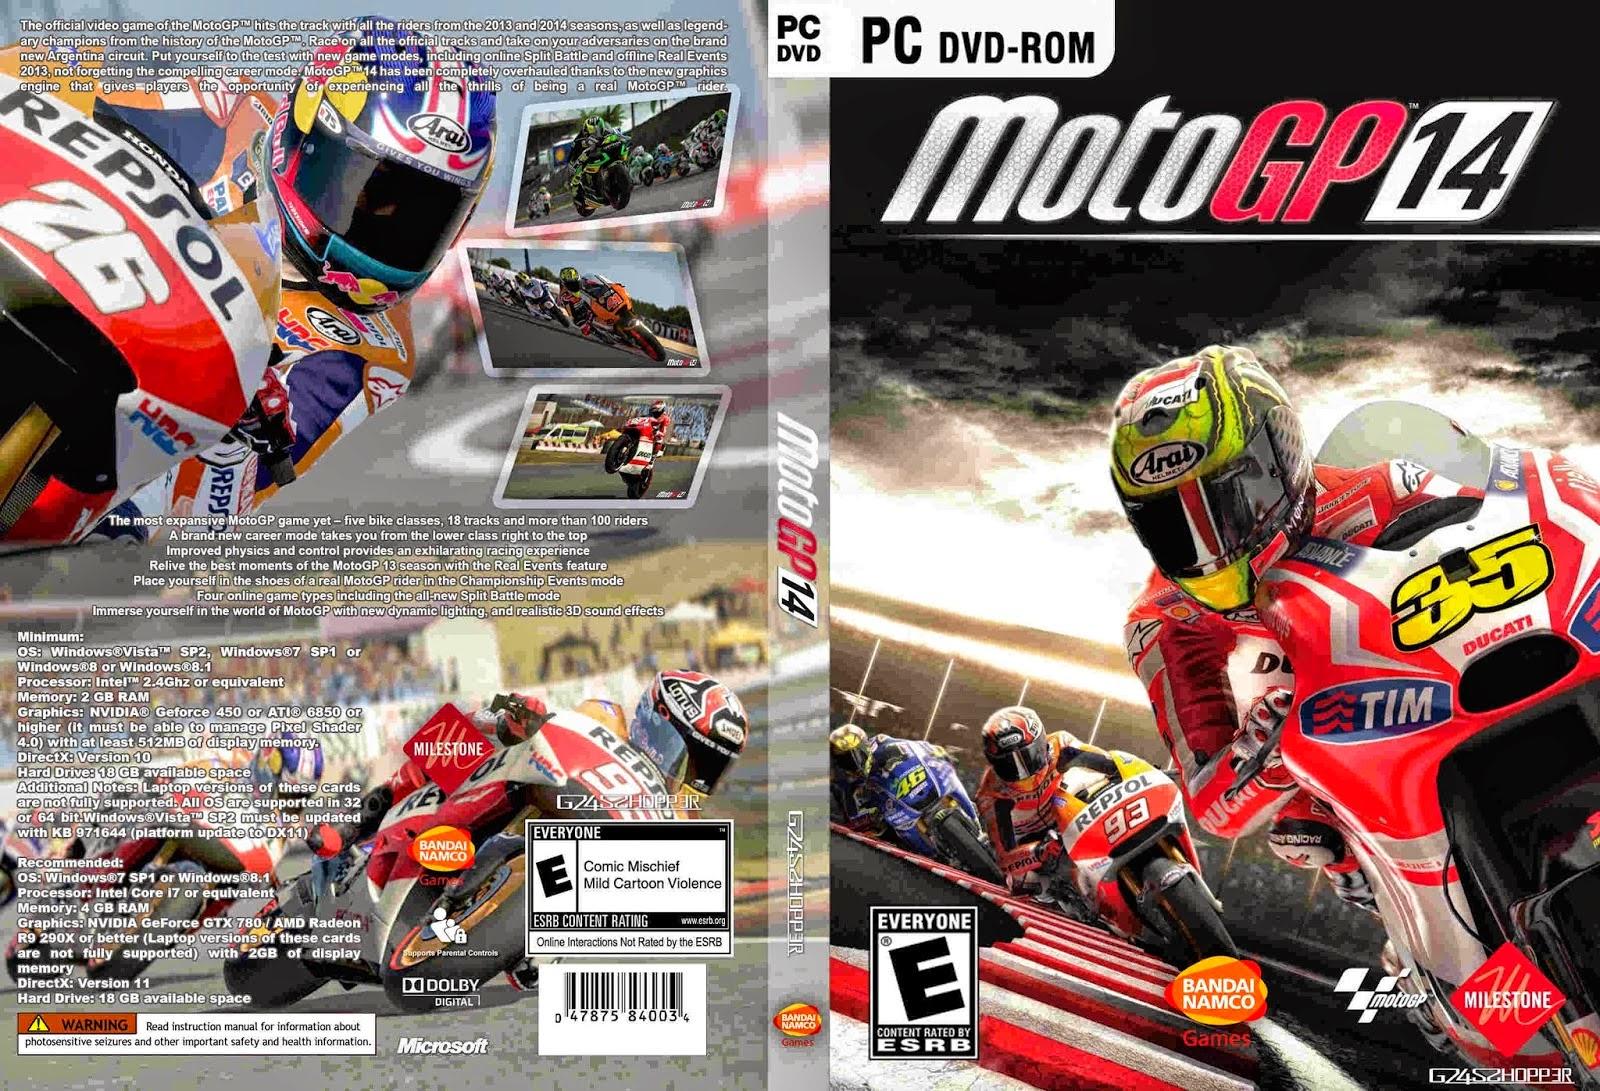 Download Game Pc Motogp 14 Full Version News Blog Media